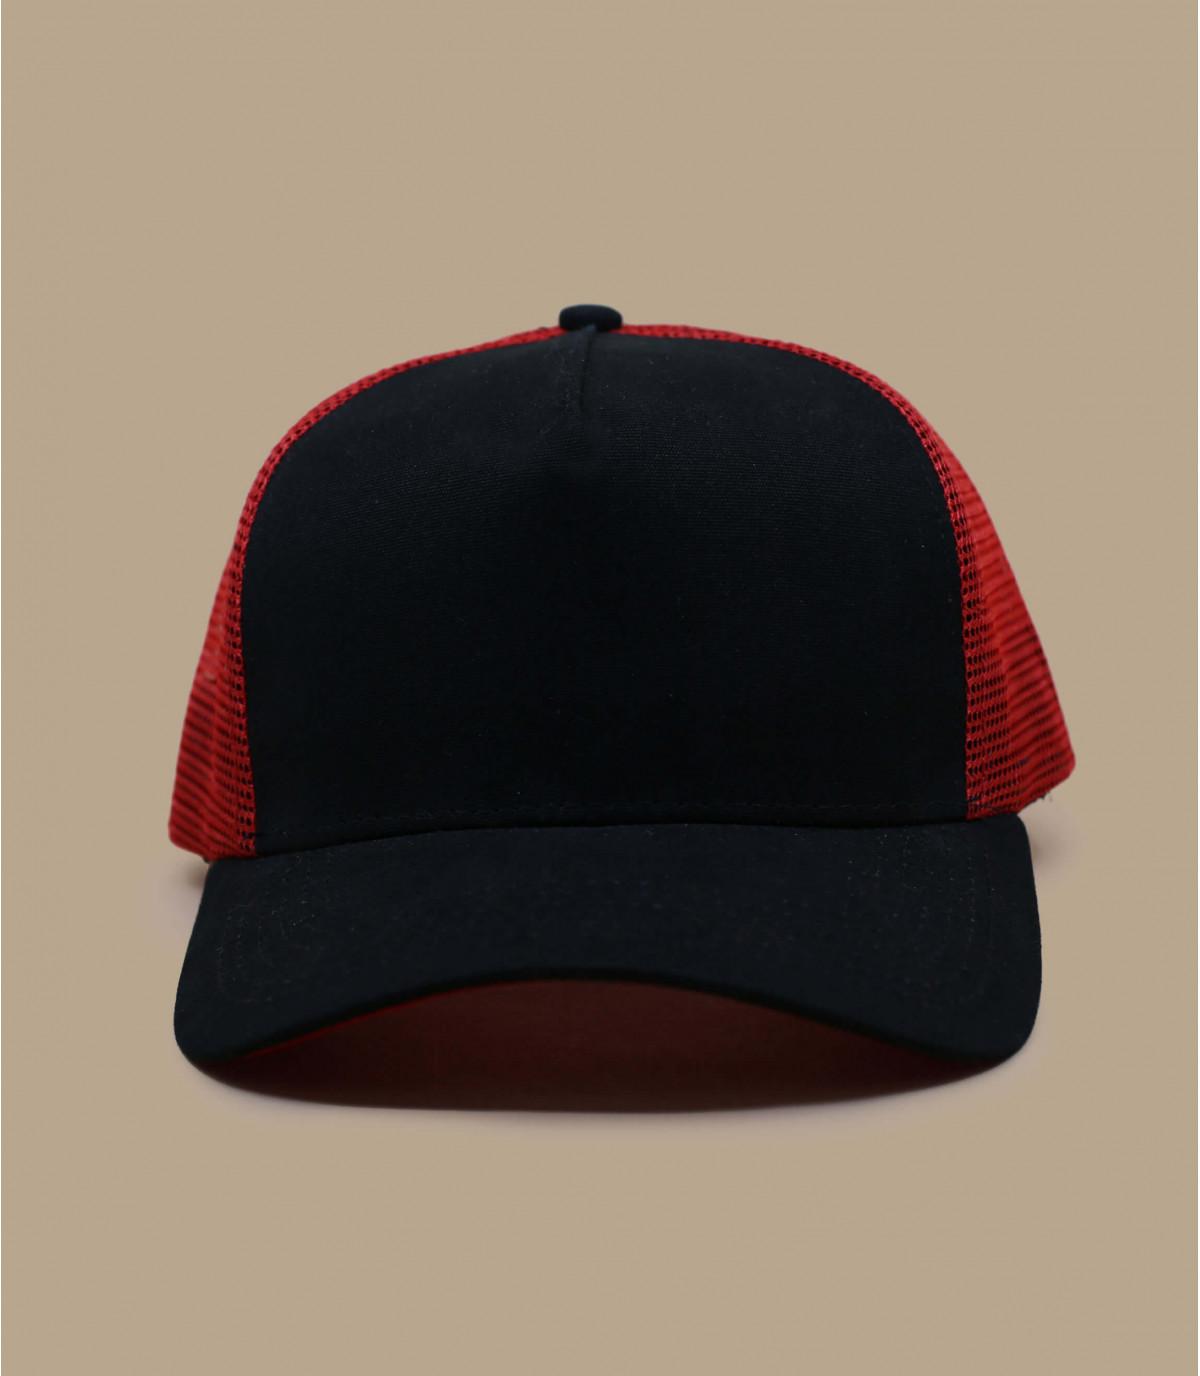 Trucker Blank black red